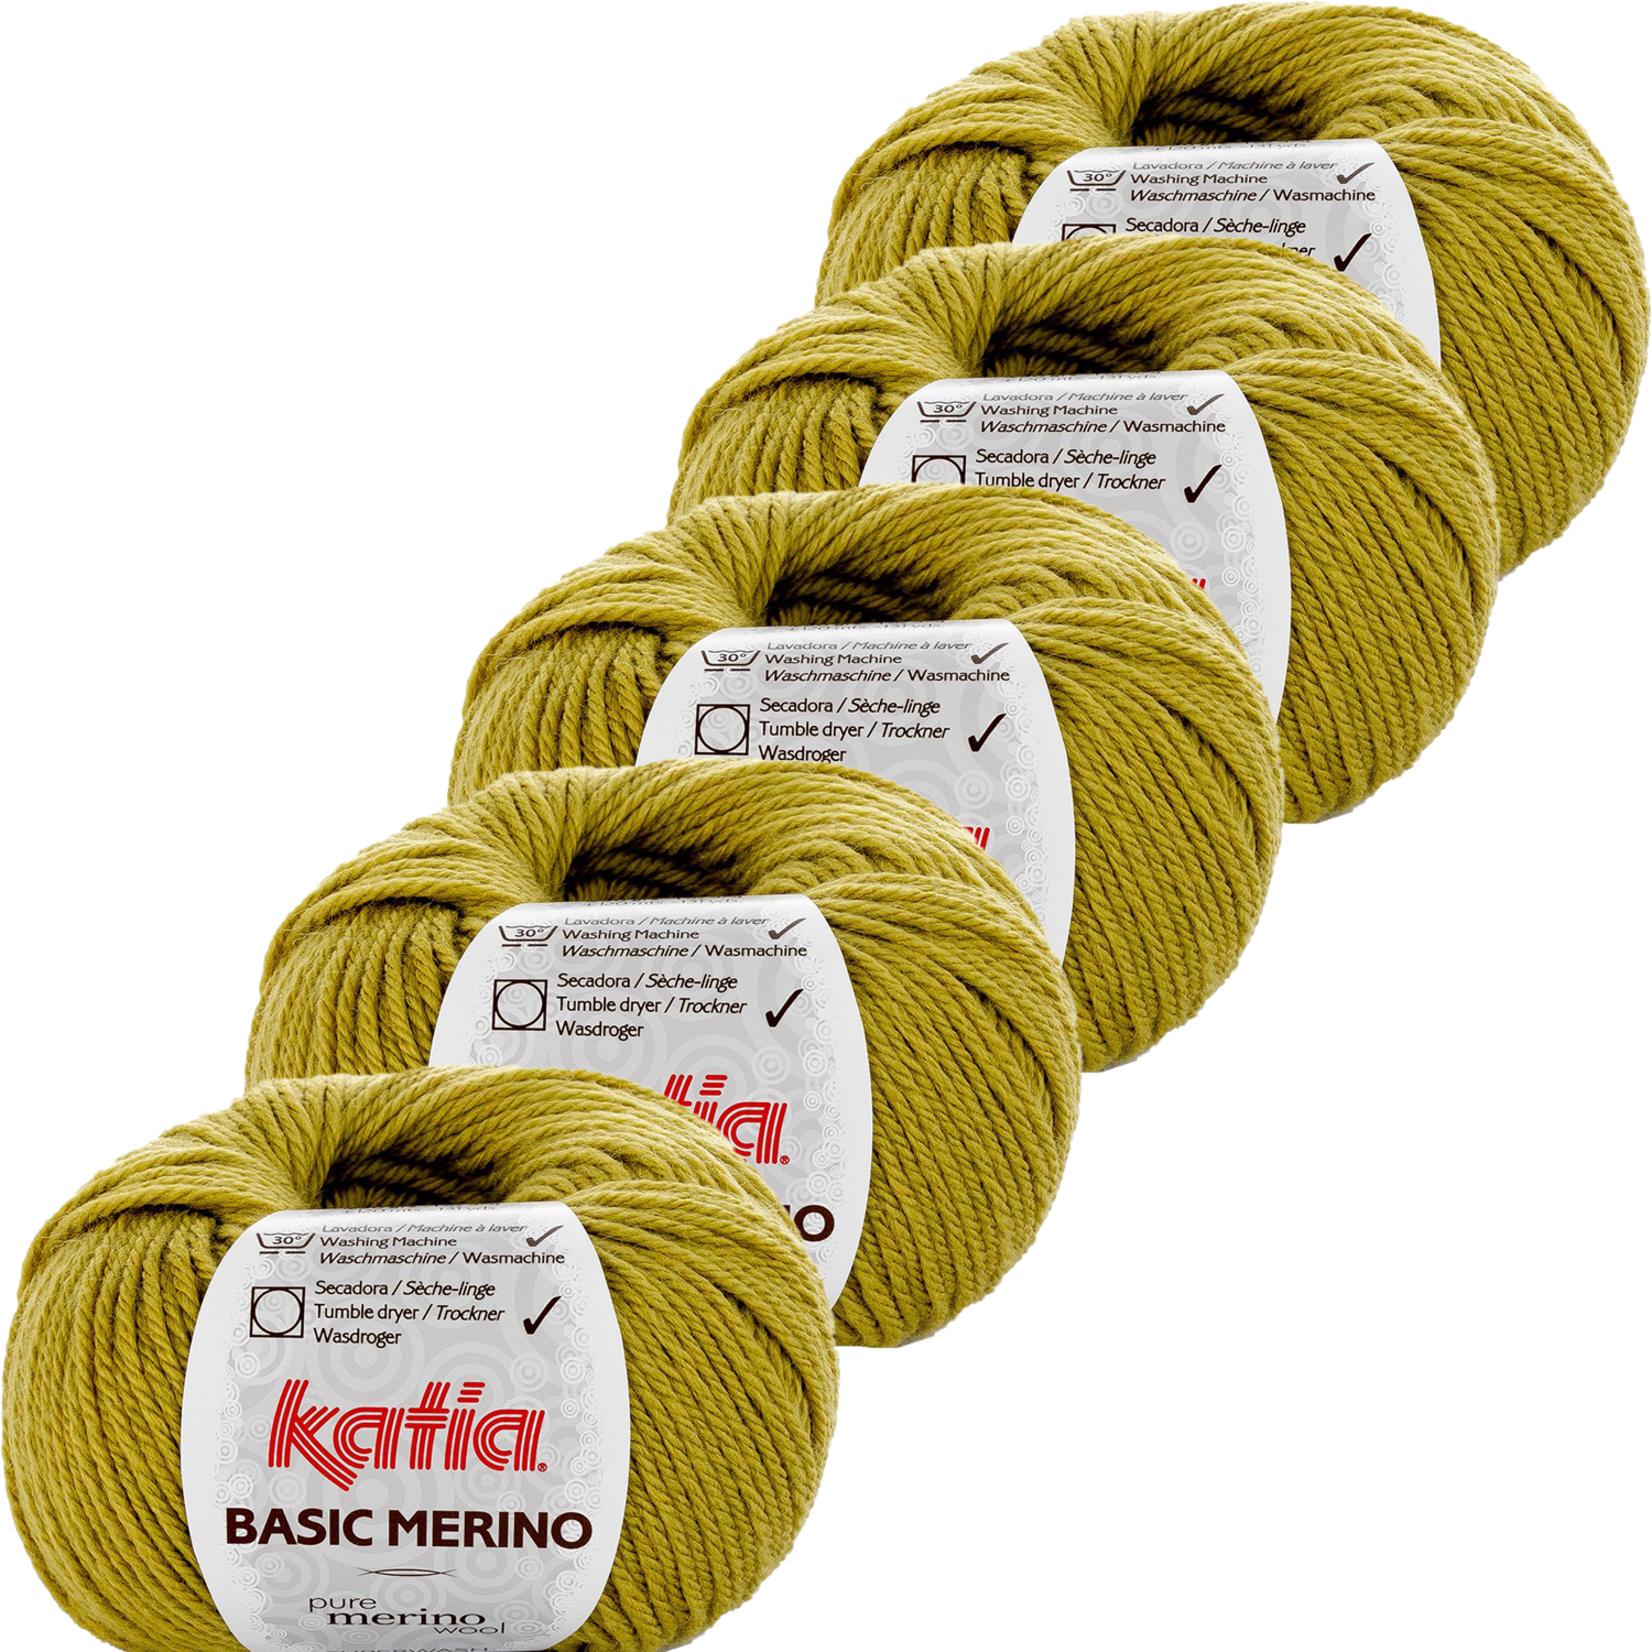 Katia Basic Merino - kleur 18_Pistache - bundel 5 bollen 50 gr.  van 120 m.